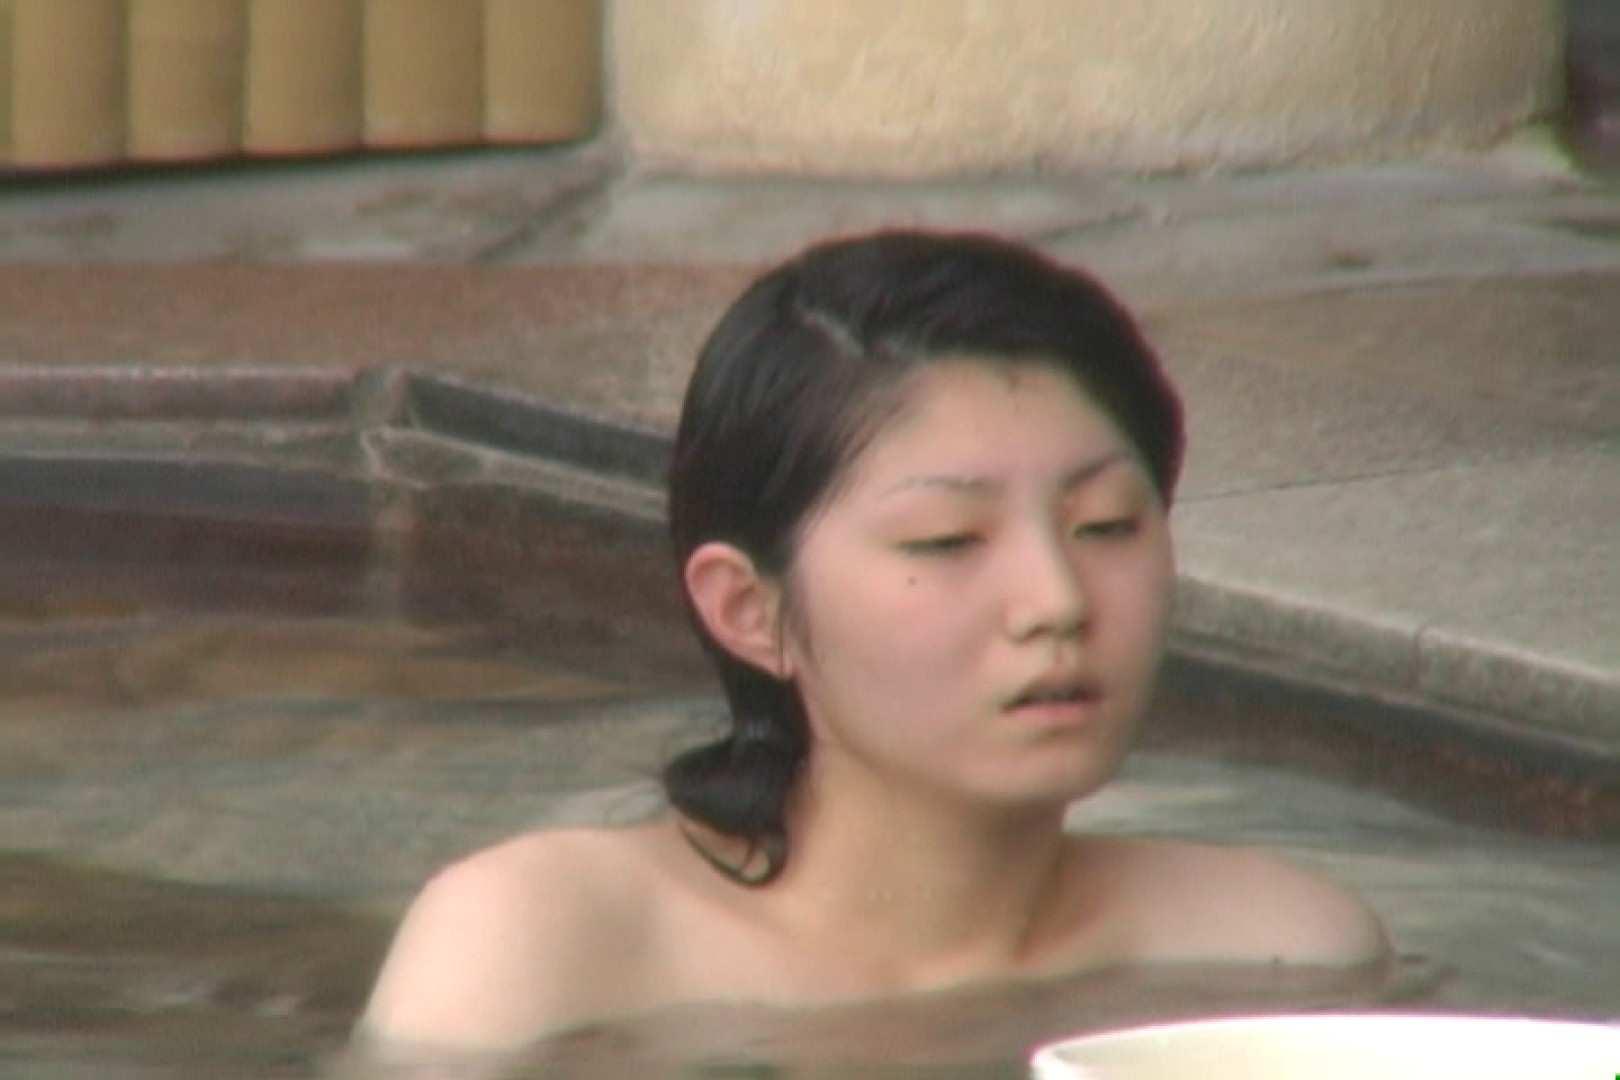 Aquaな露天風呂Vol.579 綺麗なOLたち  68枚 51